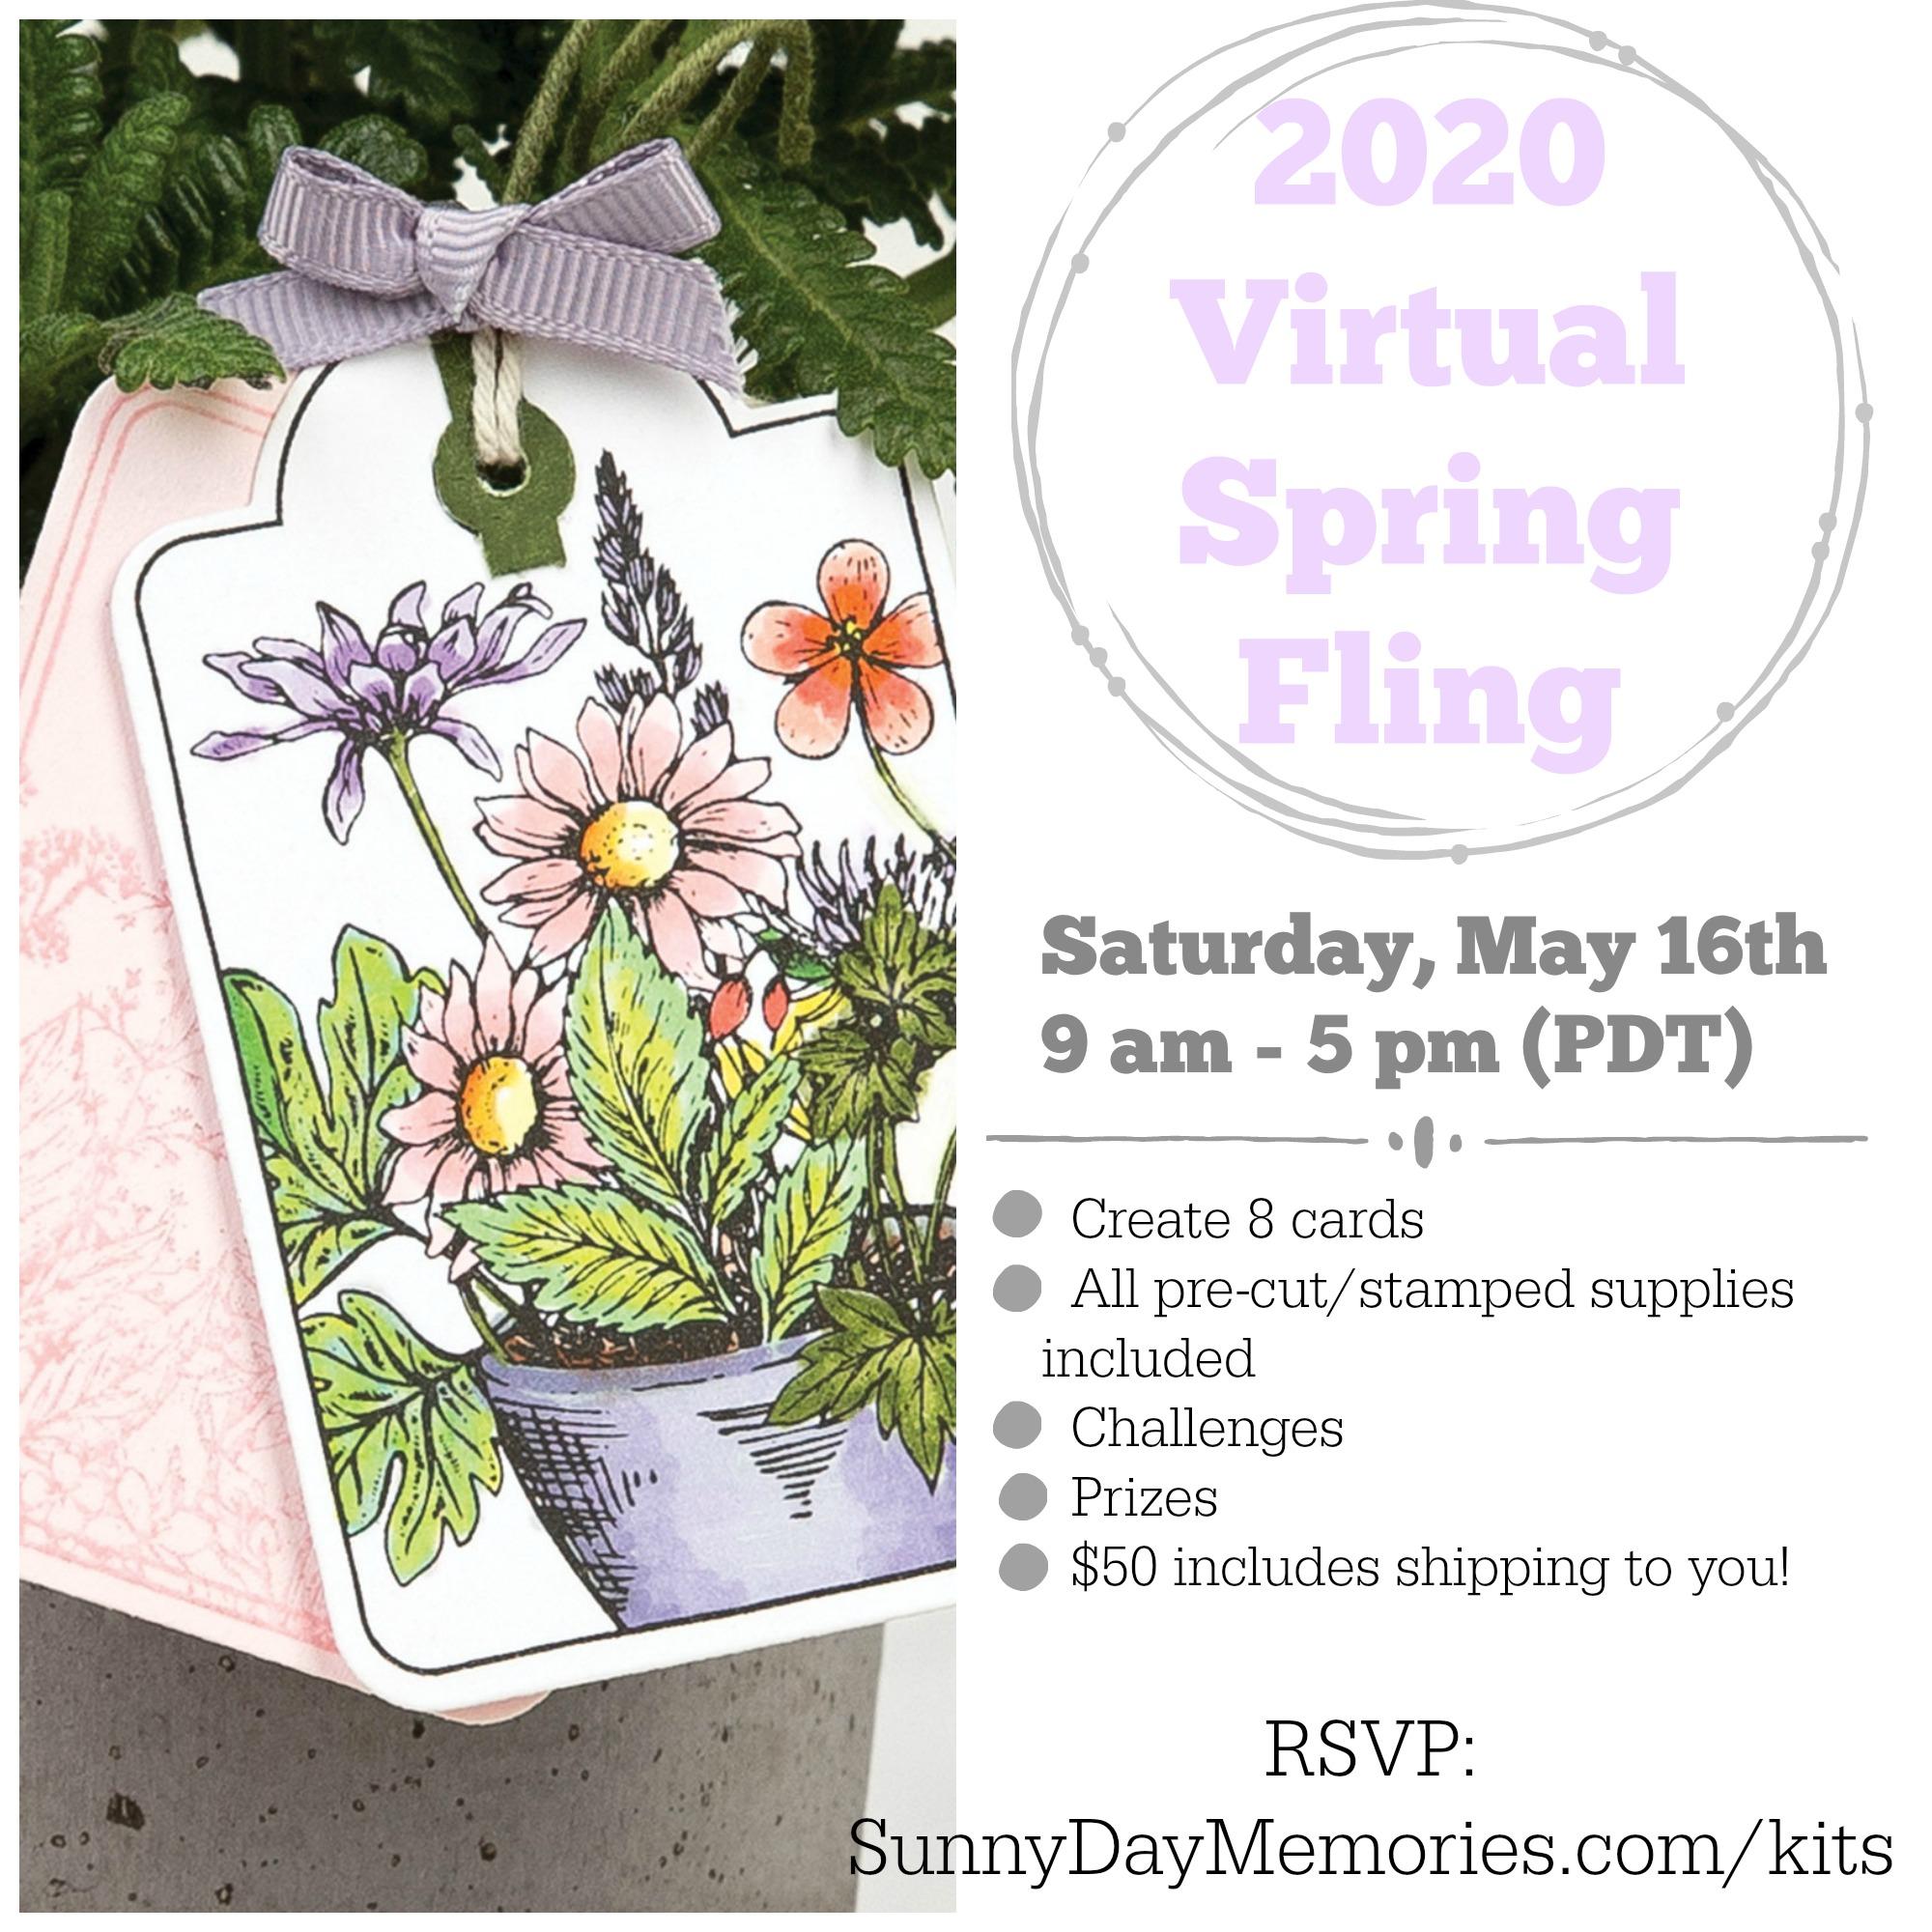 2020 Virtual Spring Fling Event